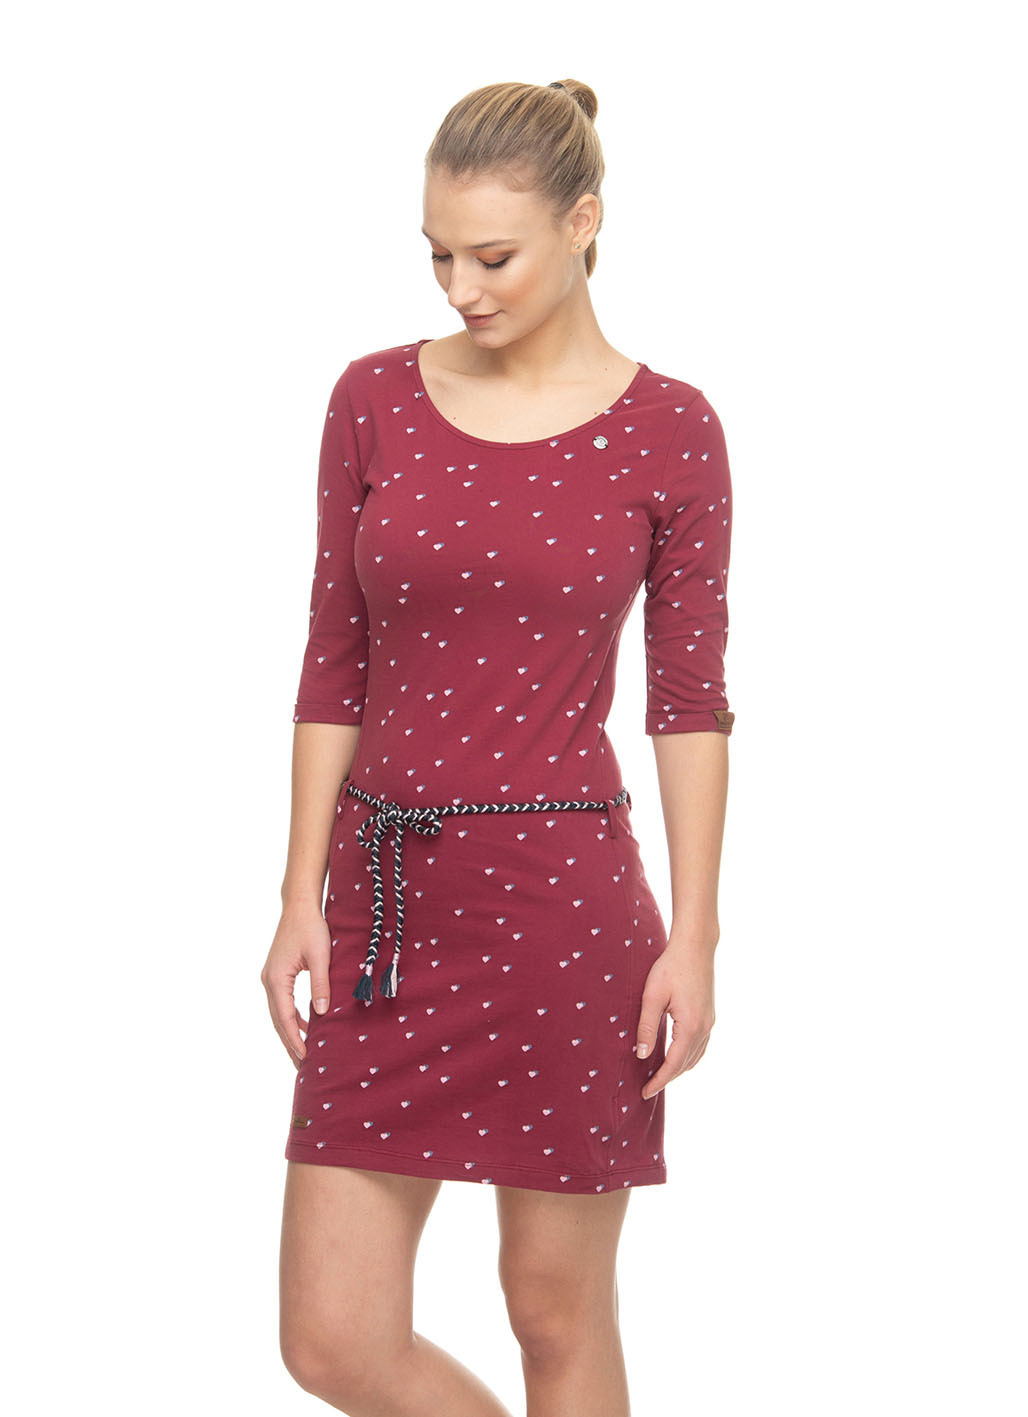 Ragwear Kleid Tamy  Größe M  Farbe Wine Red